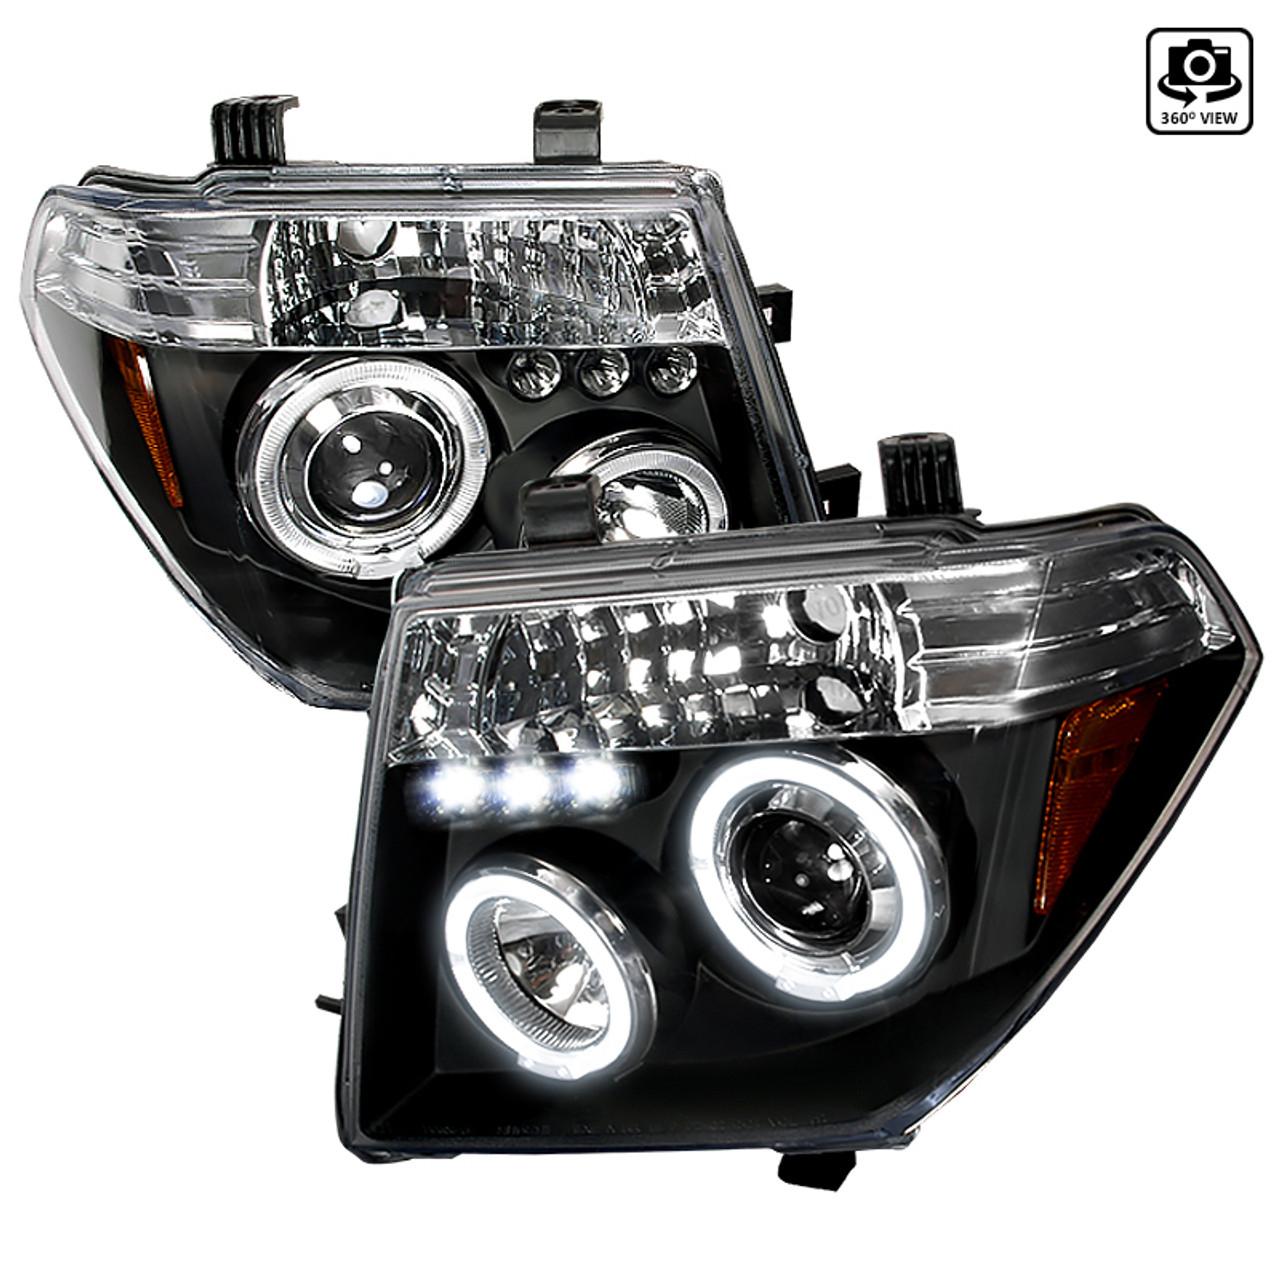 2005 2007 Nissan Pathfinder Dual Halo Projector Headlights W Amber Reflectors Matte Black Housing Clear Lens Spec D Tuning